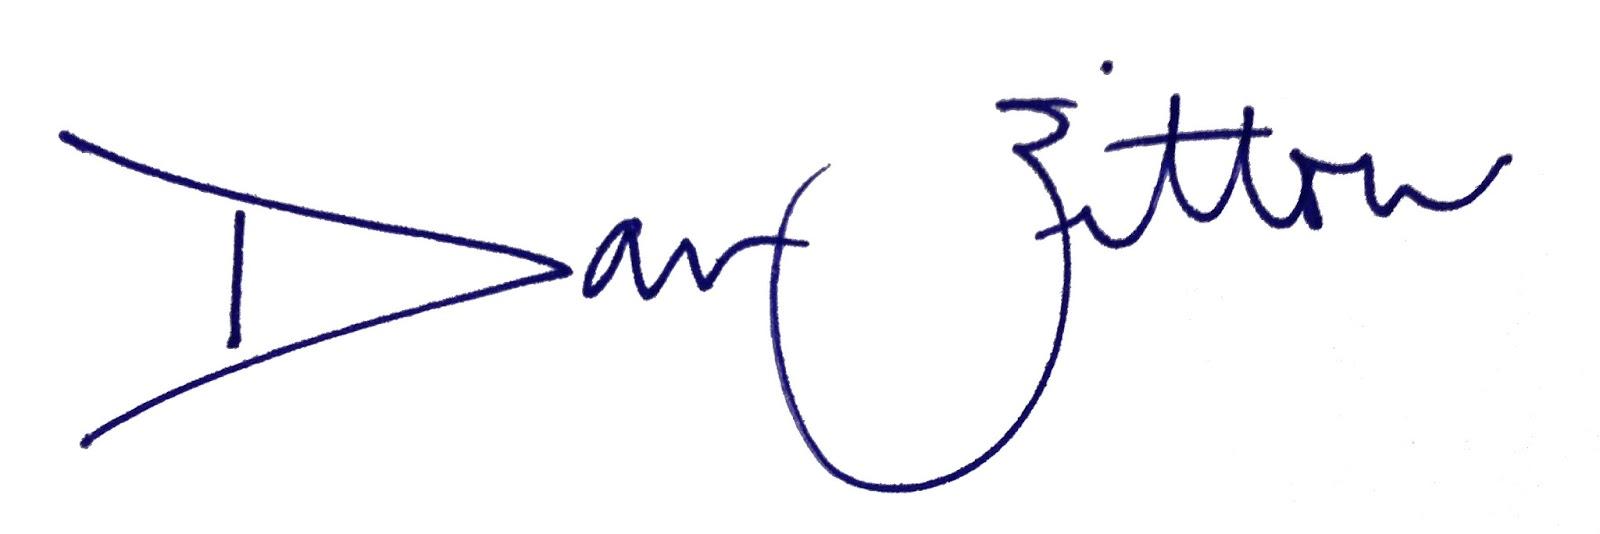 dz signature.jpg